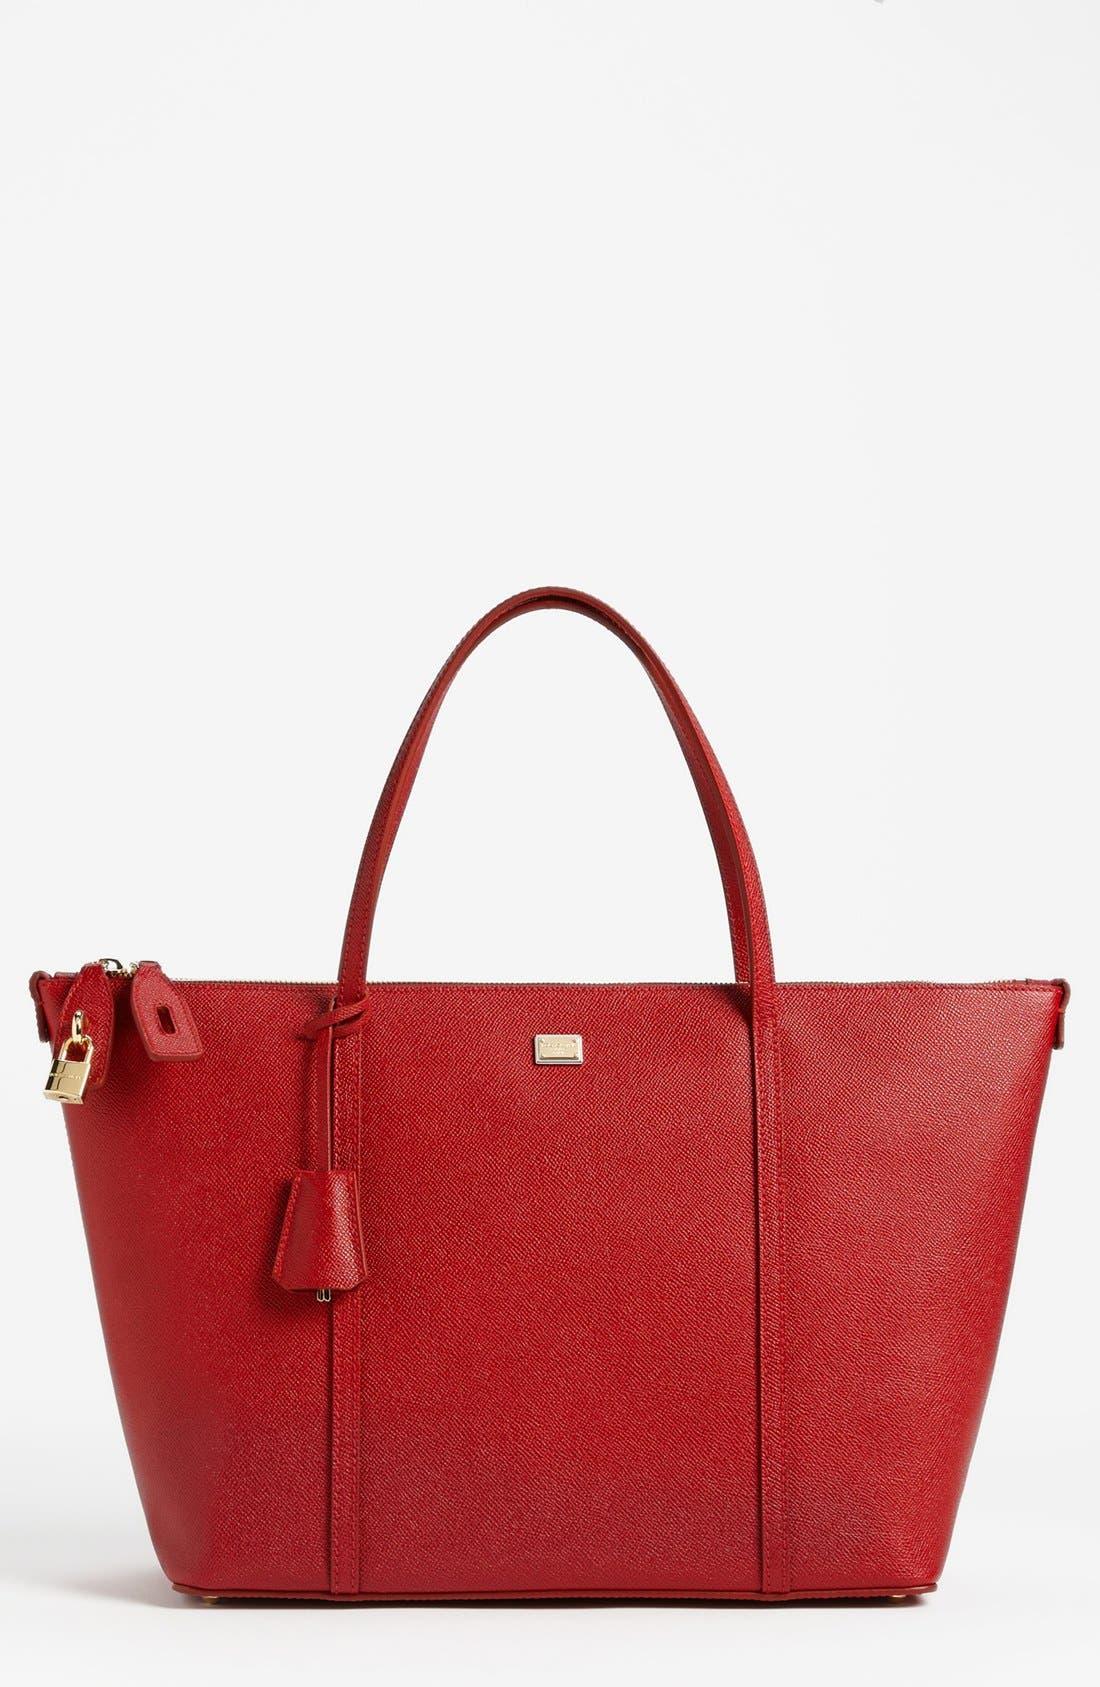 Main Image - Dolce&Gabbana 'Miss Escape - Classic' Leather Tote